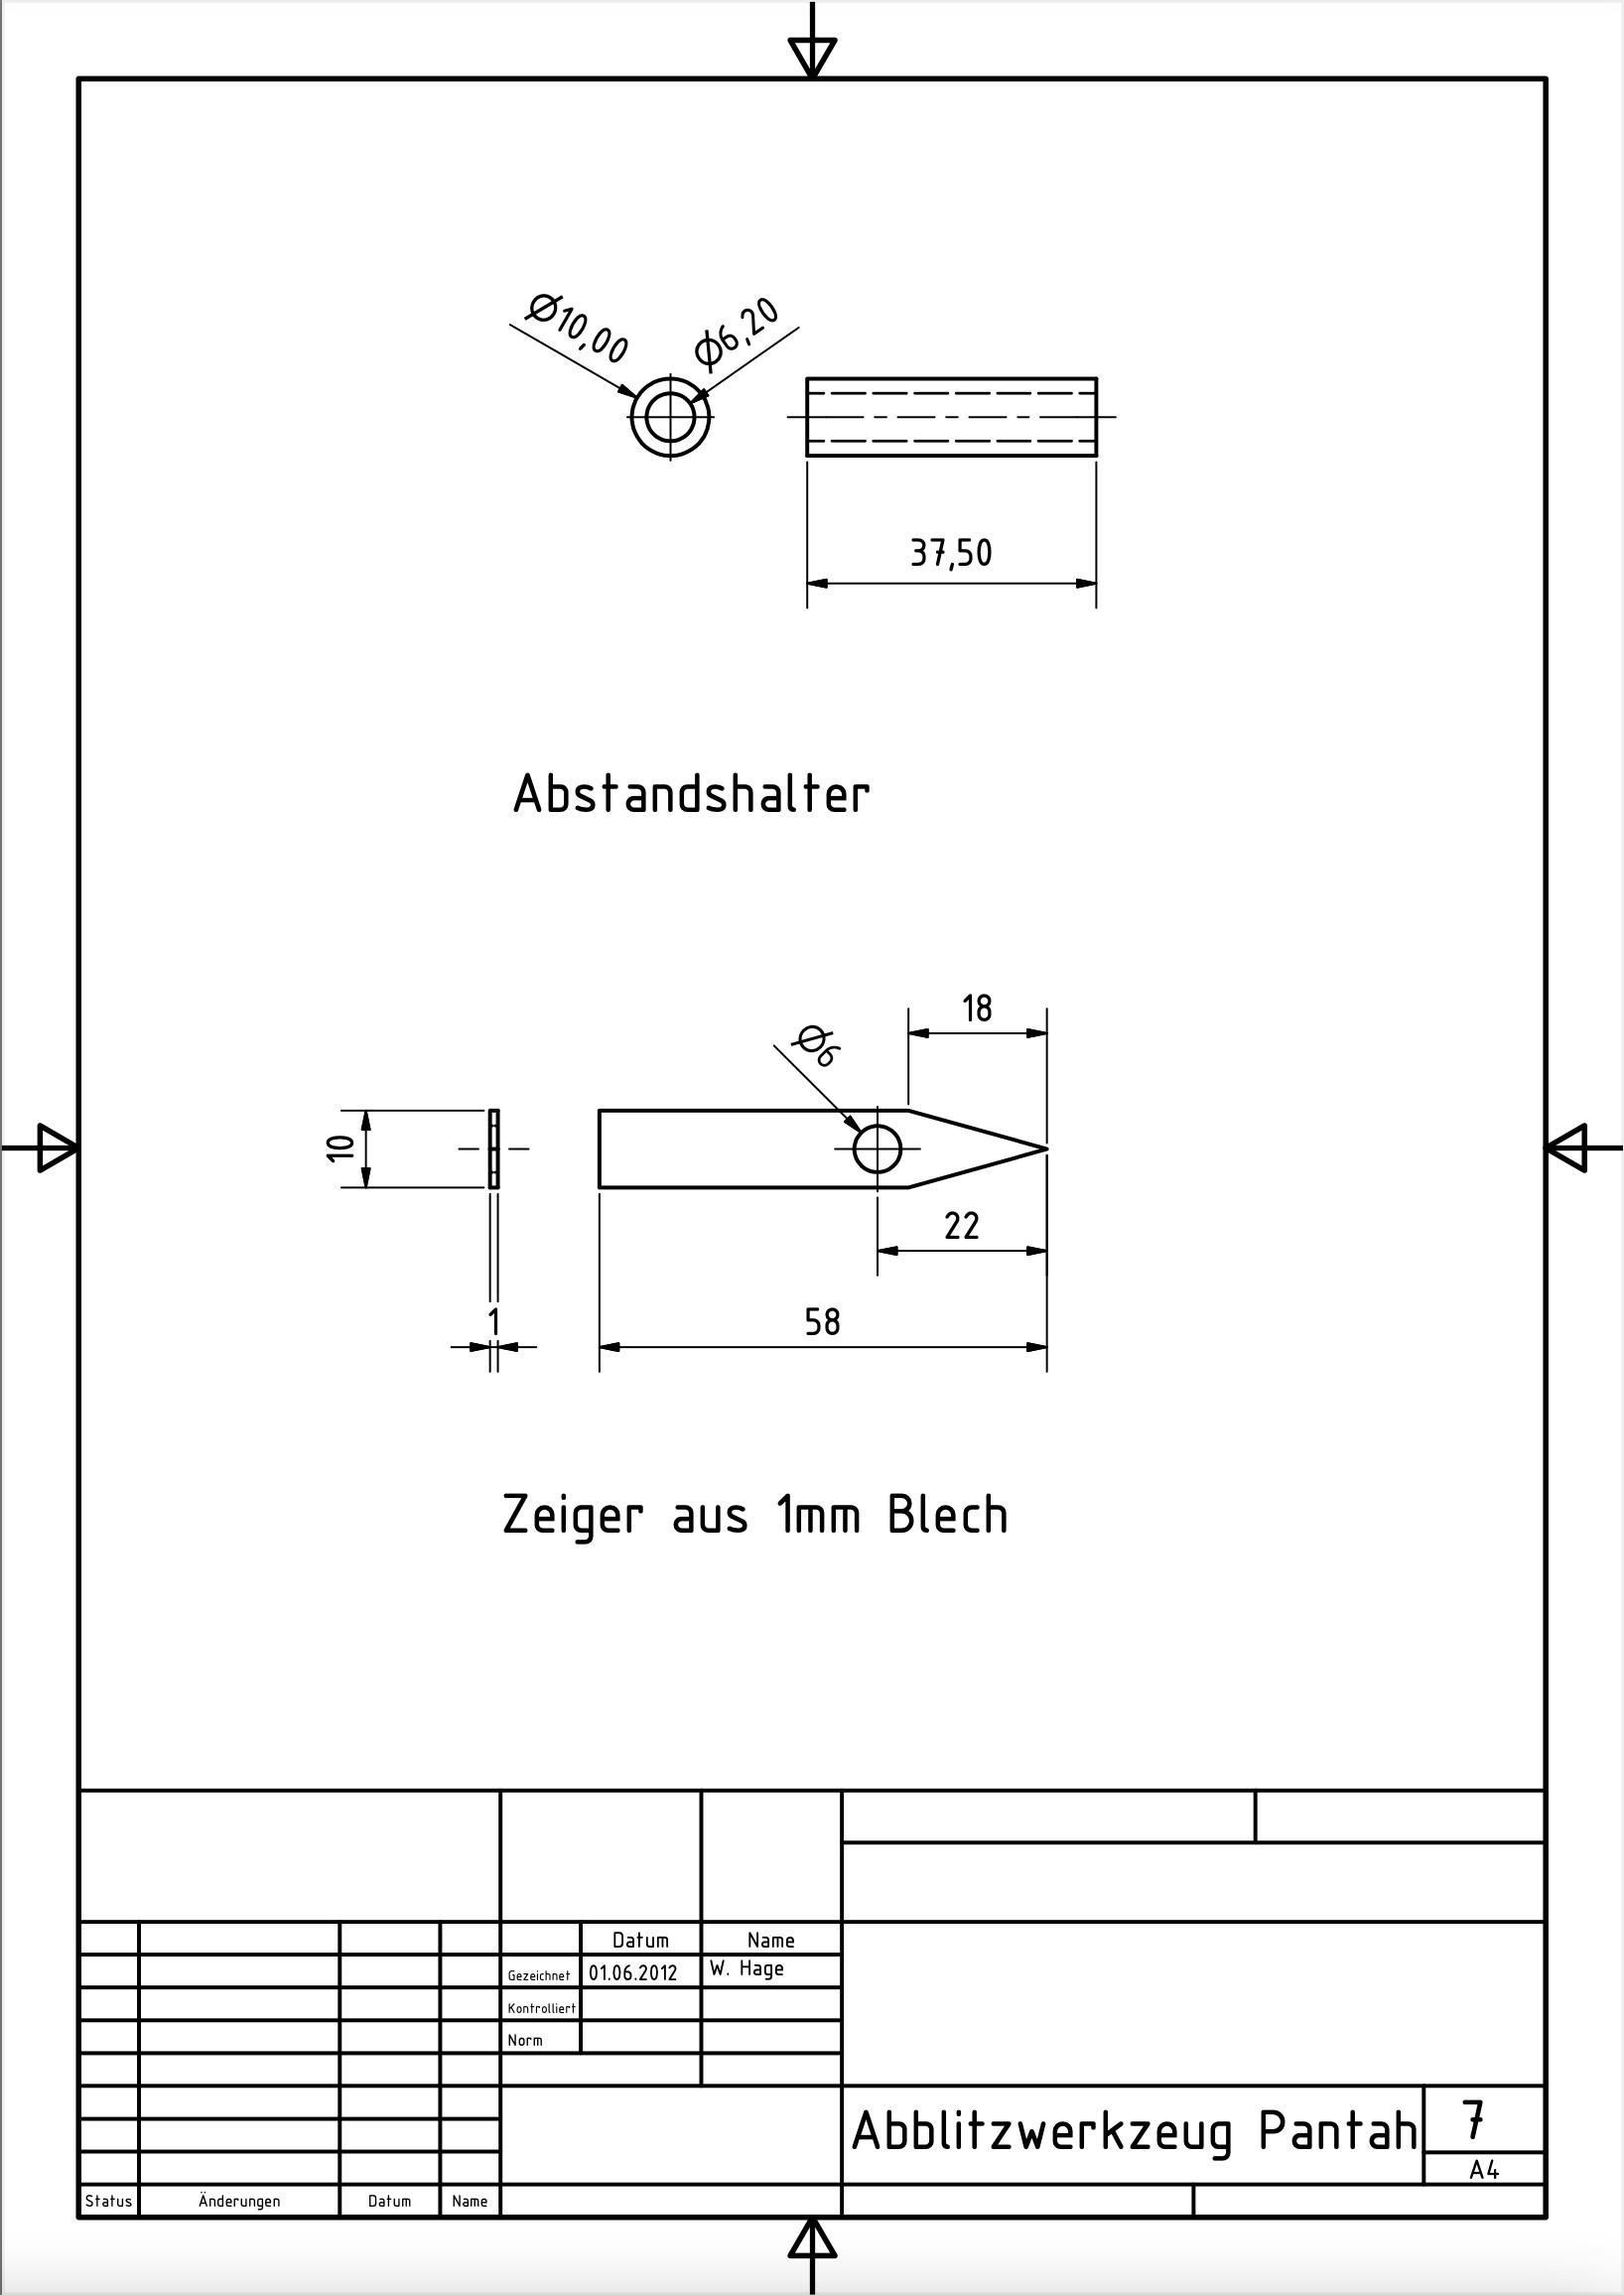 Abblitzwerkzeug Pantah 7